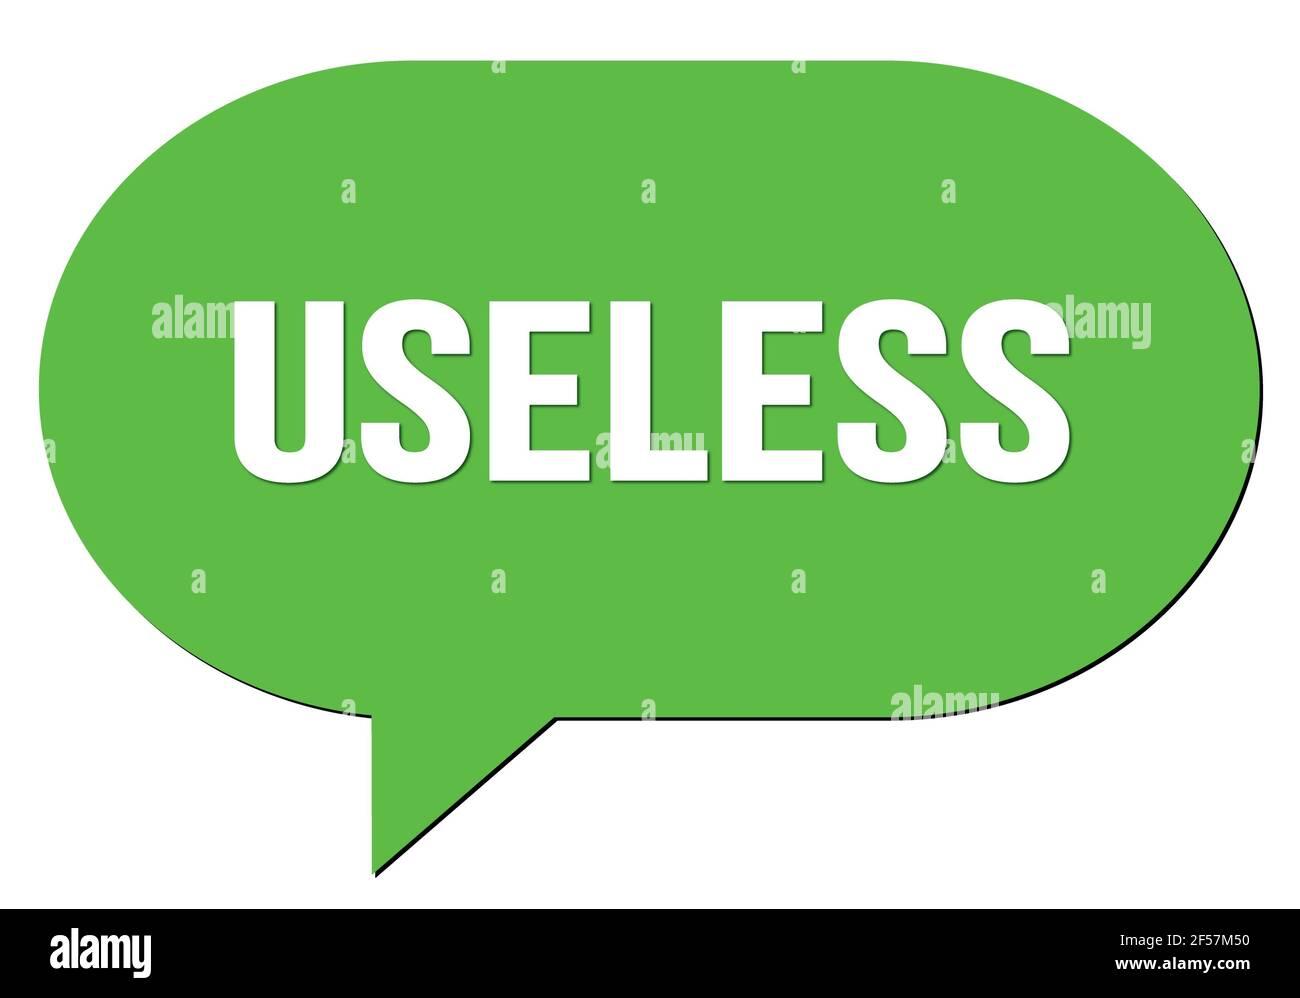 USELESS text written in a green speech bubble stamp Stock Photo